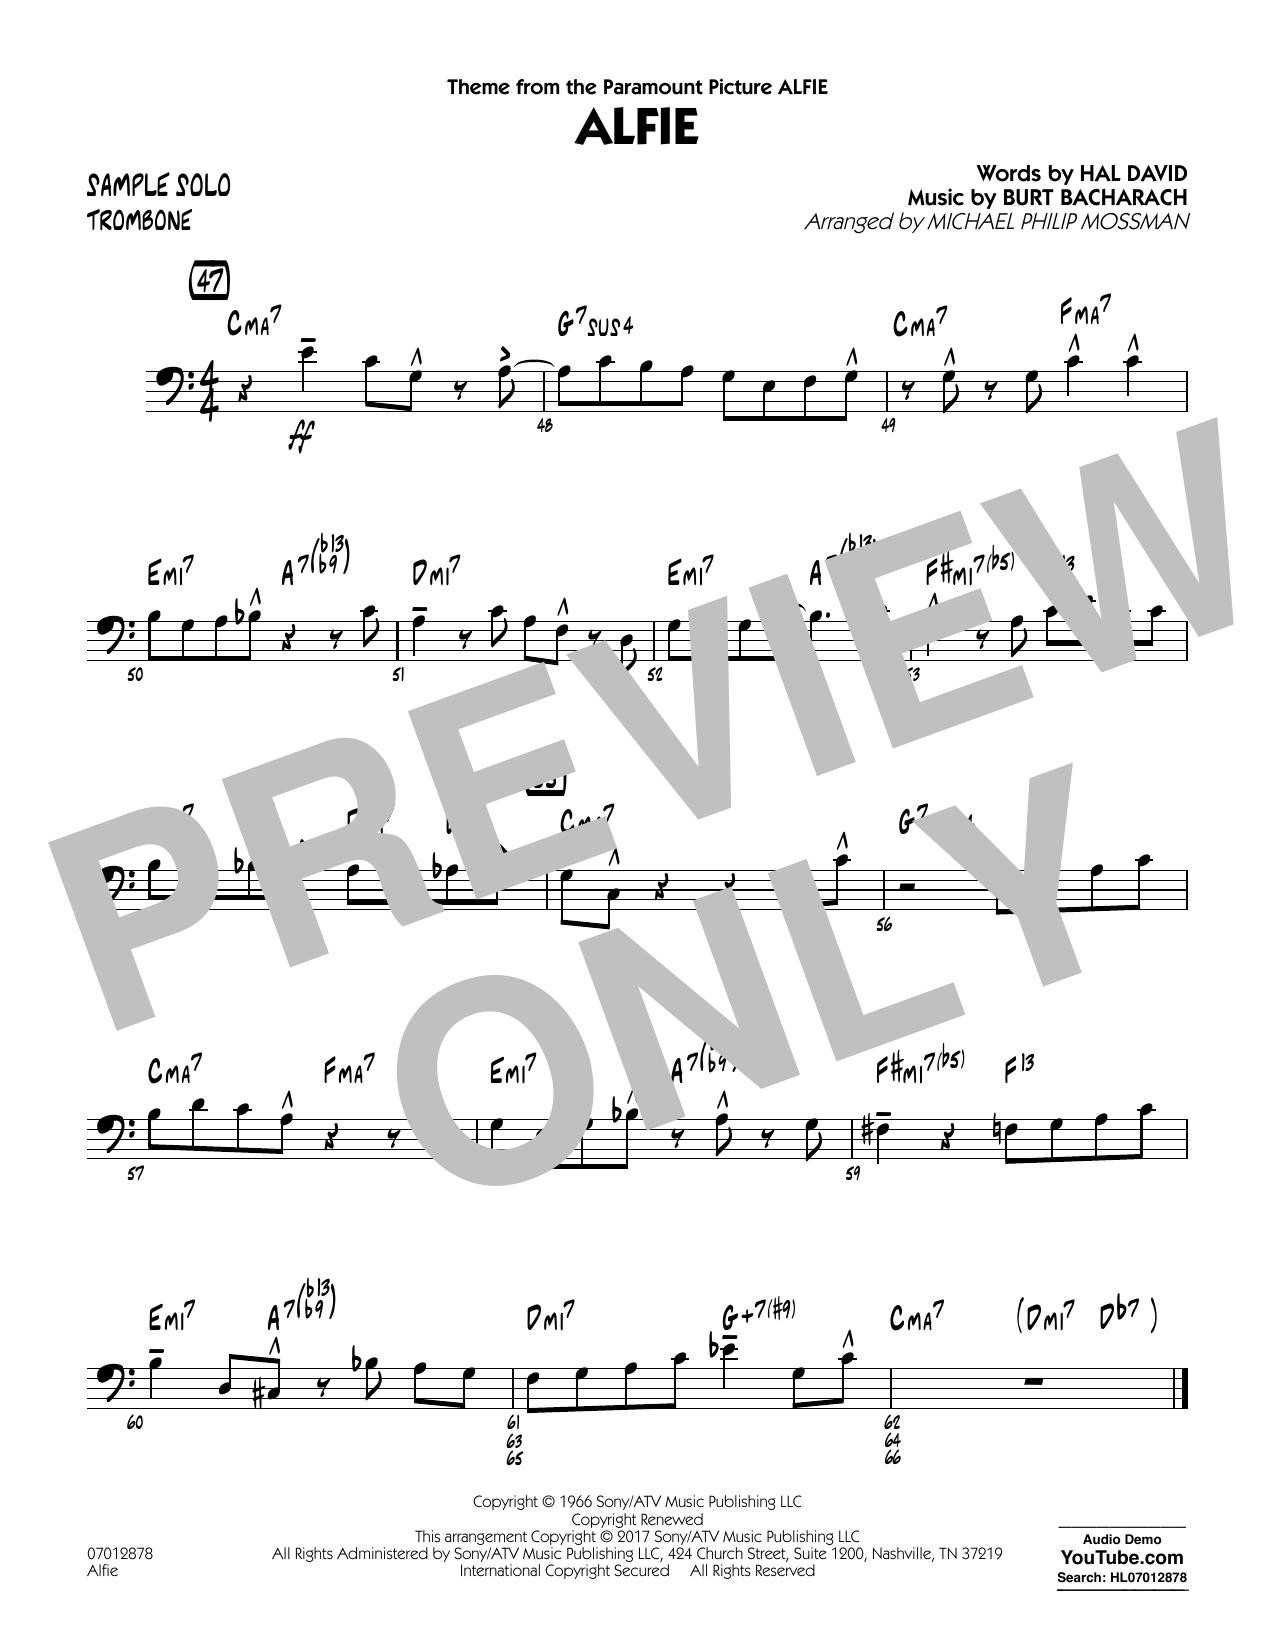 Alfie - Sample Solo - Trombone (Jazz Ensemble)